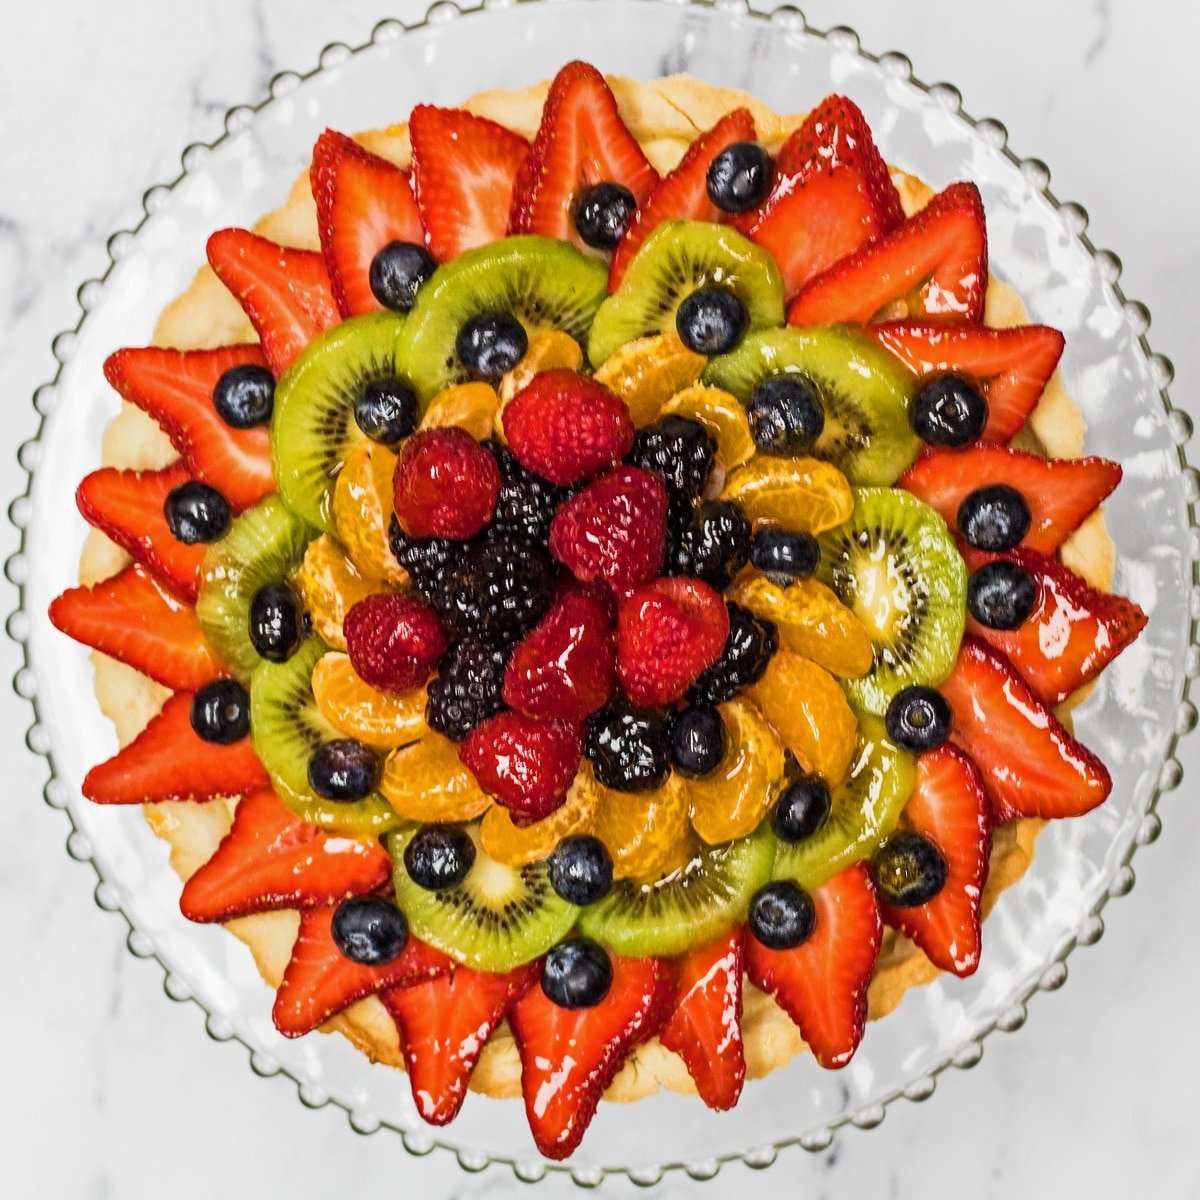 Tarte aux Fruits overhead photo on glass plate.